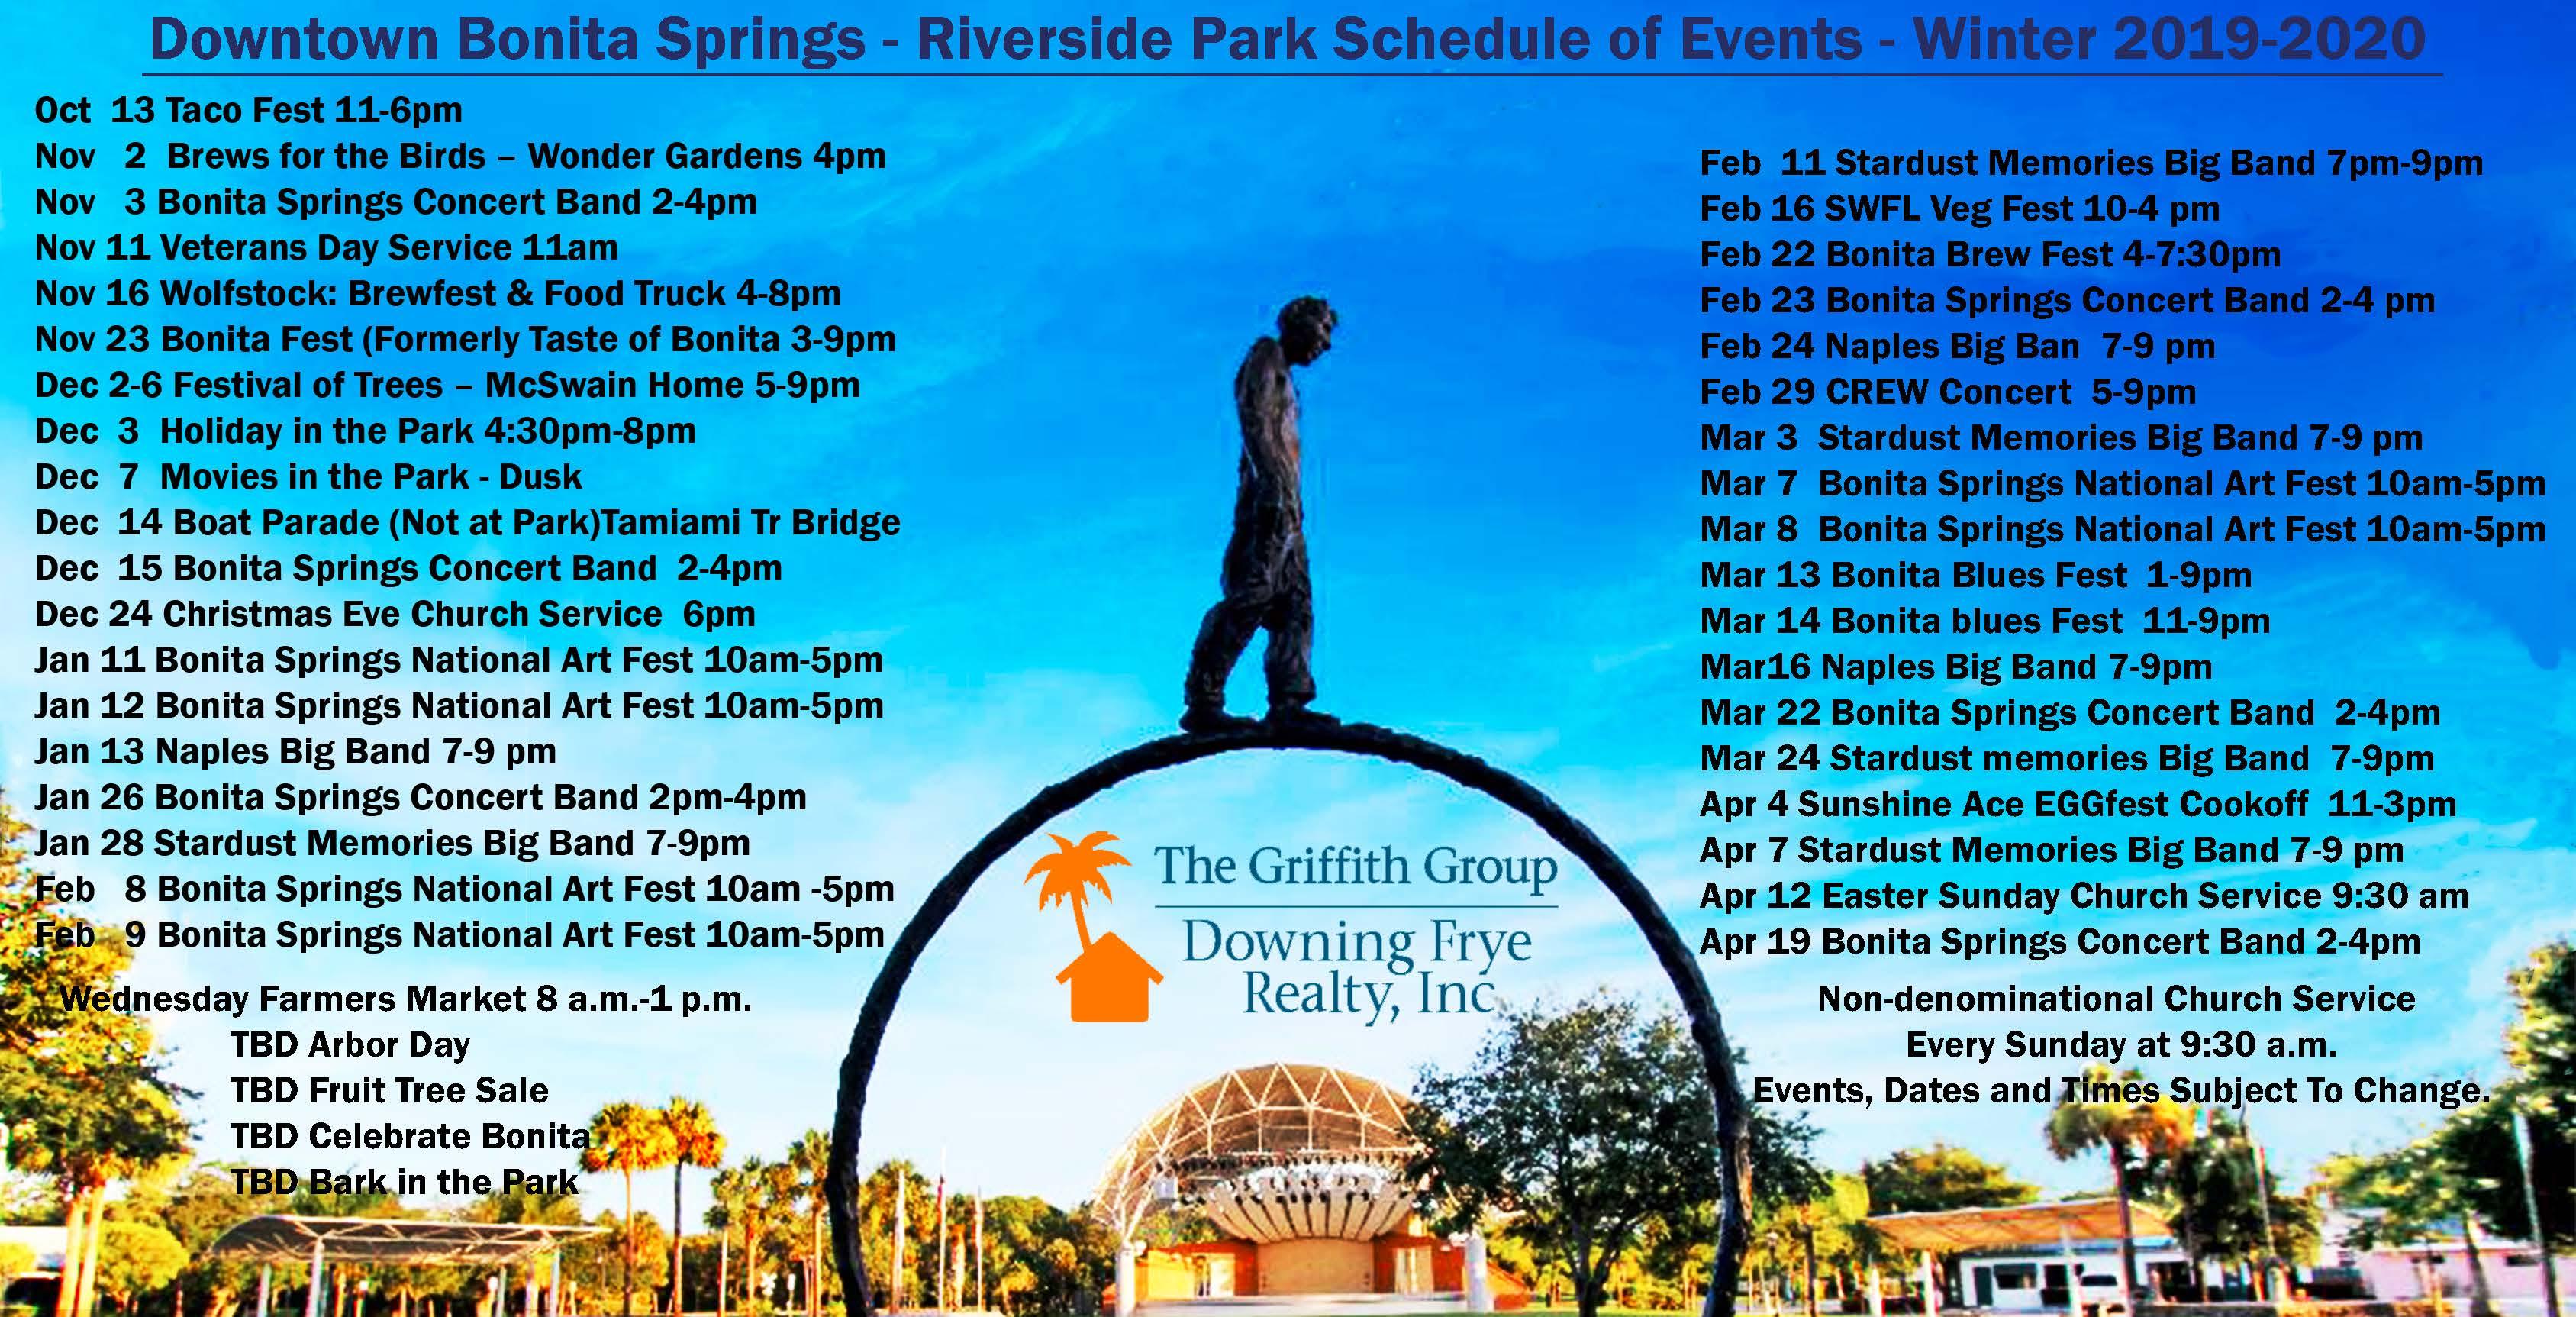 Downtown Bonita Springs Calendar of Events